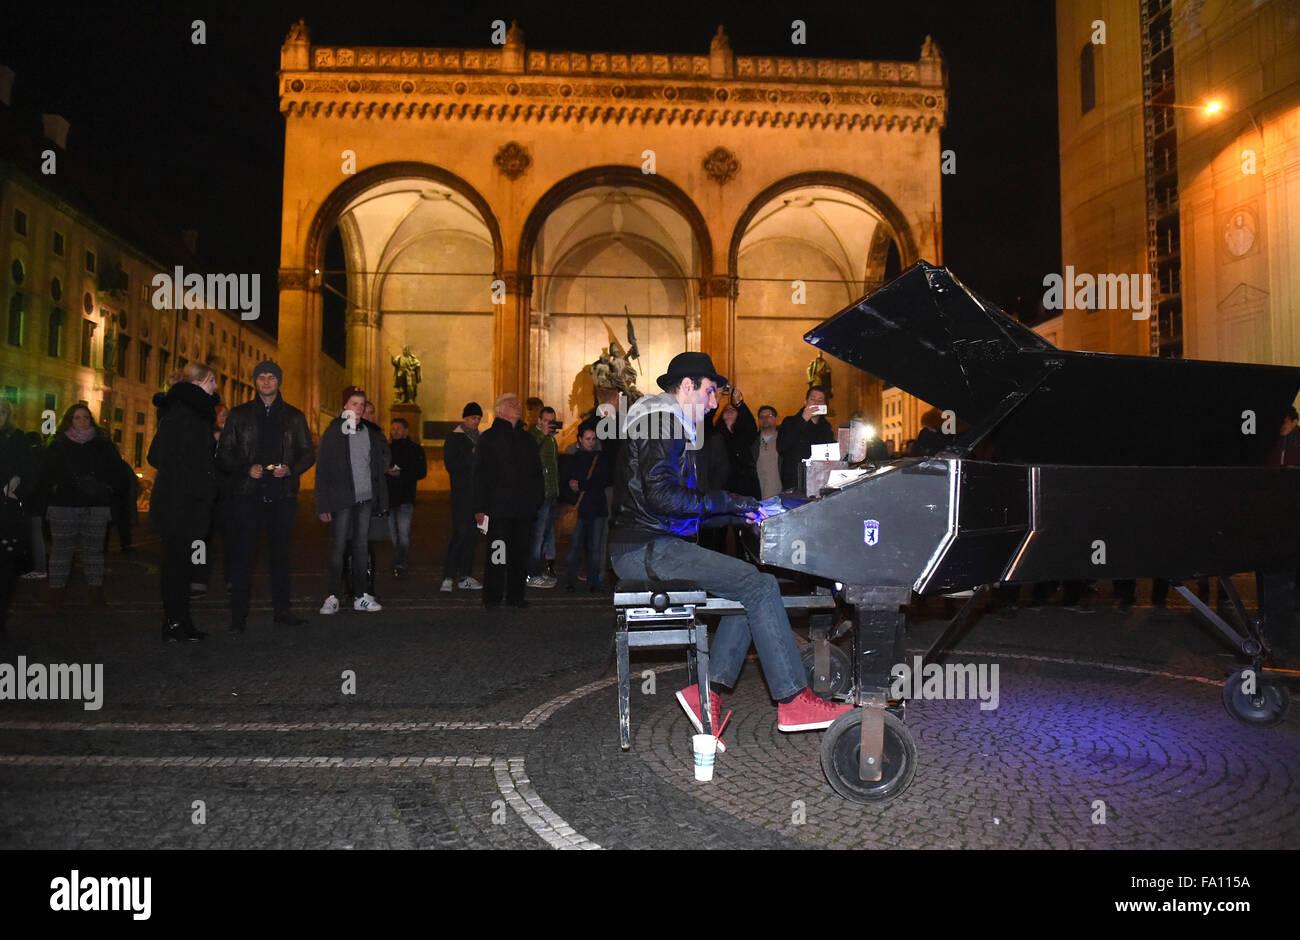 Munich, Germany. 18th Dec, 2015. Street musician David Martello performs at night at the Odeonsplatz square in Munich, Stock Photo